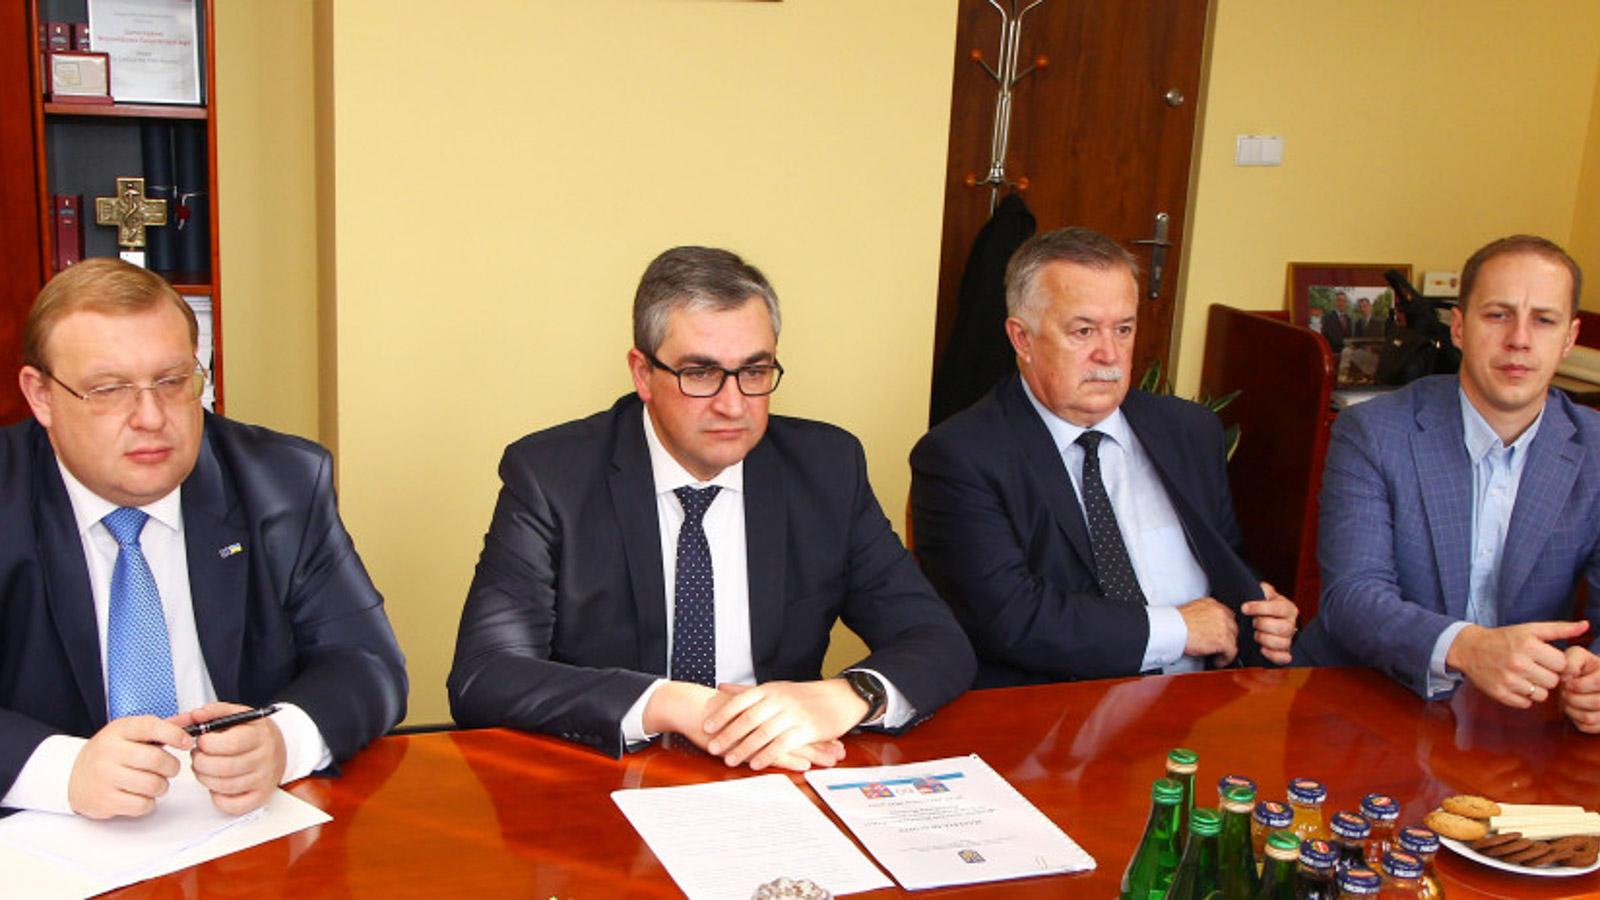 Wizyta-delegacji-z-Ukrainy-3-1024x464